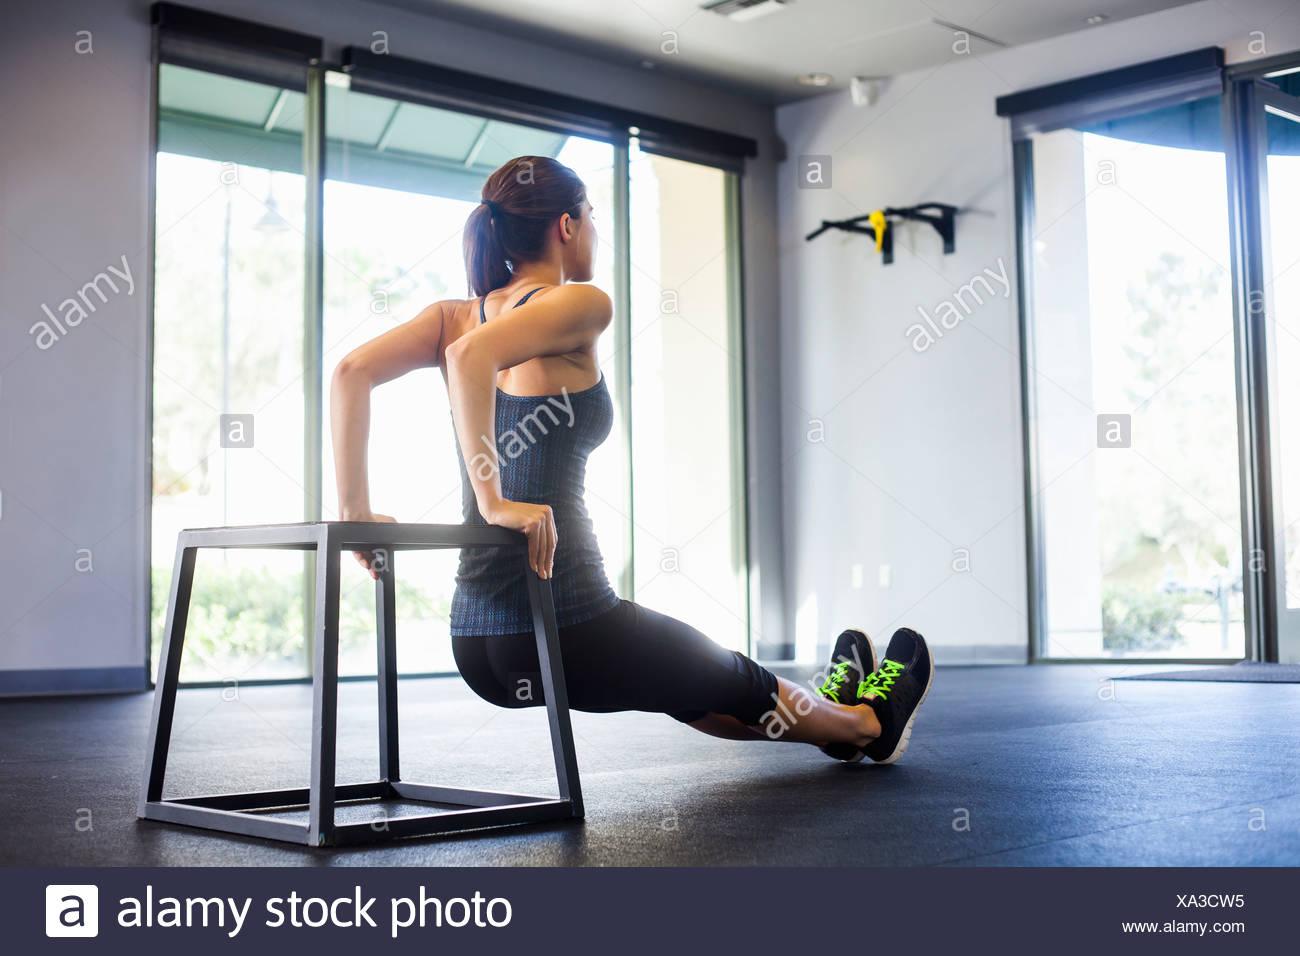 Young woman doing push ups - Stock Image